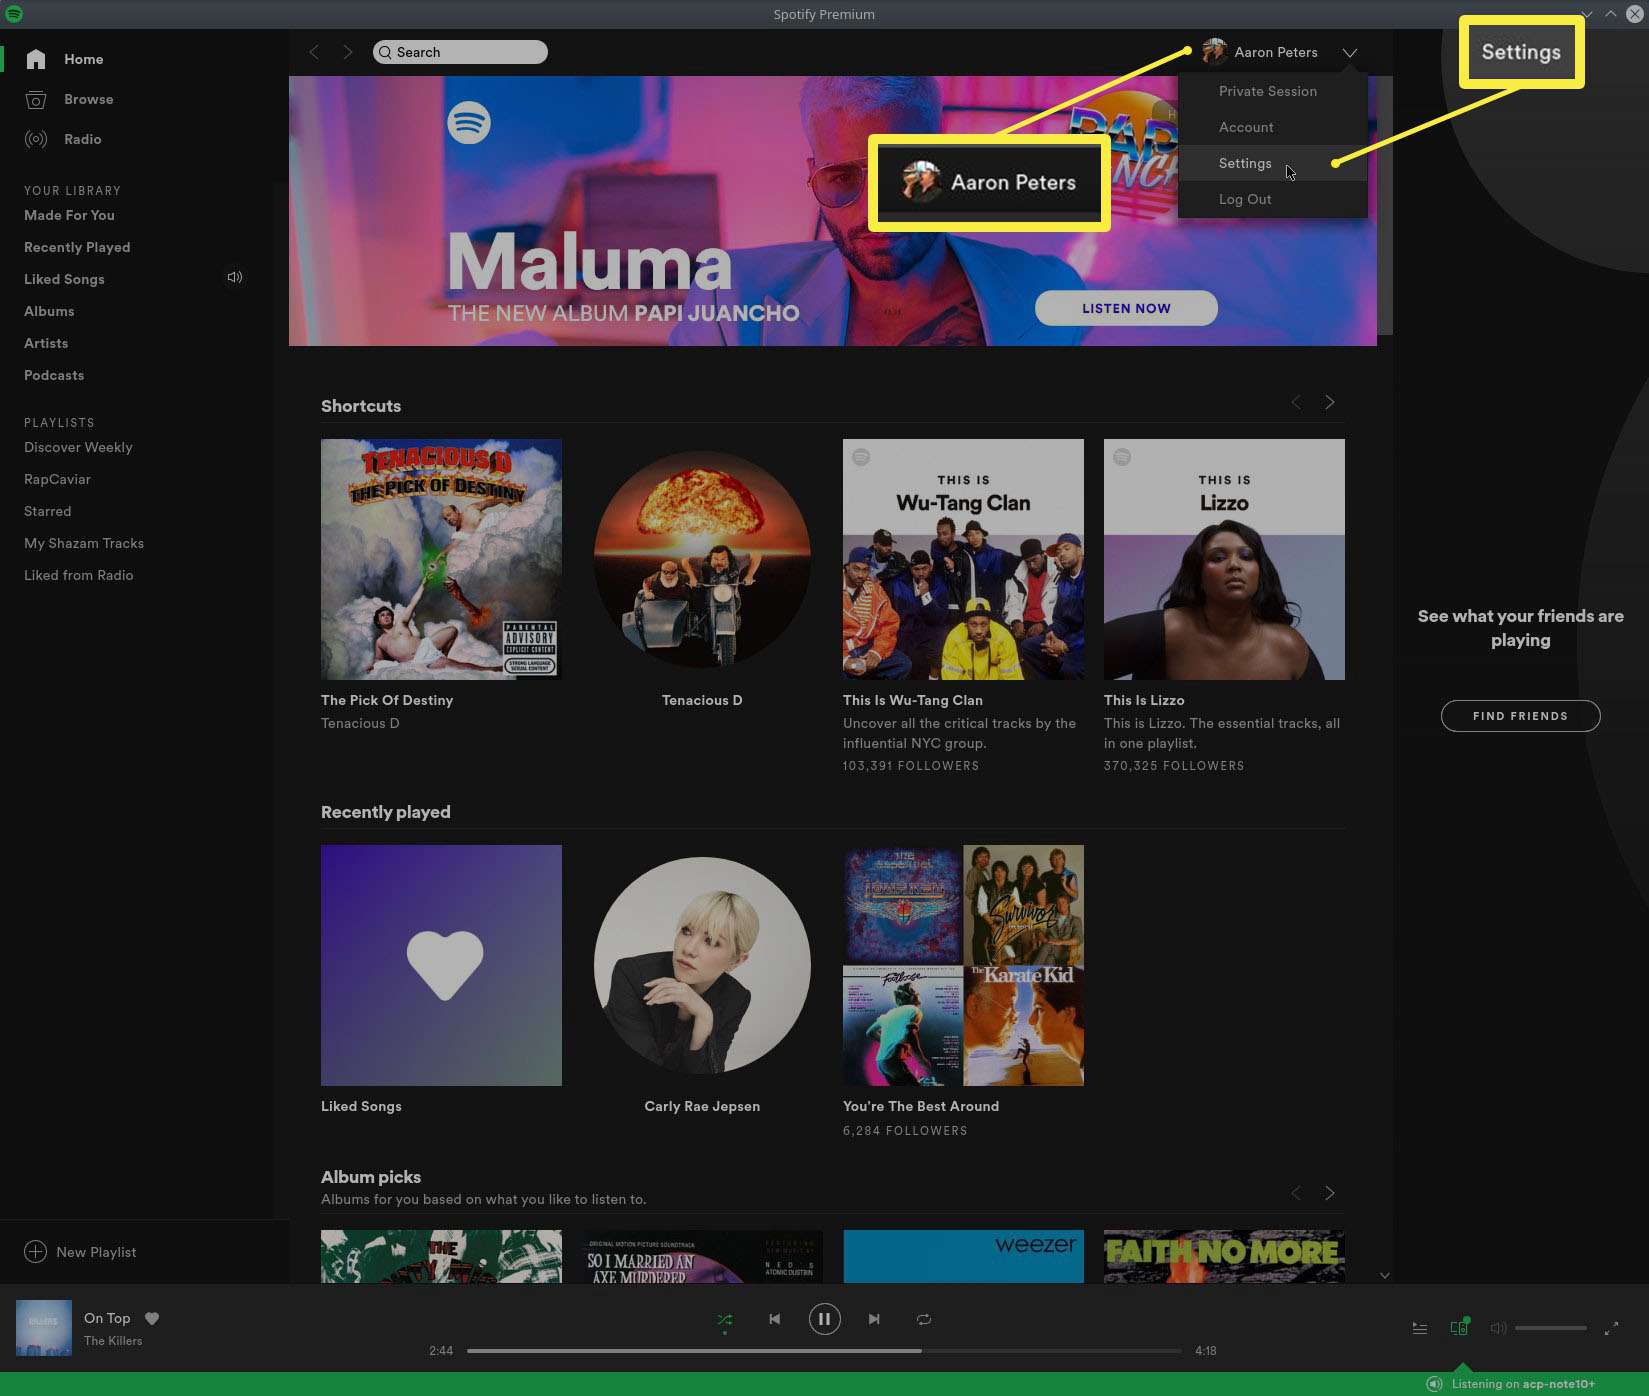 The Spotify User Menu's Settings Option.